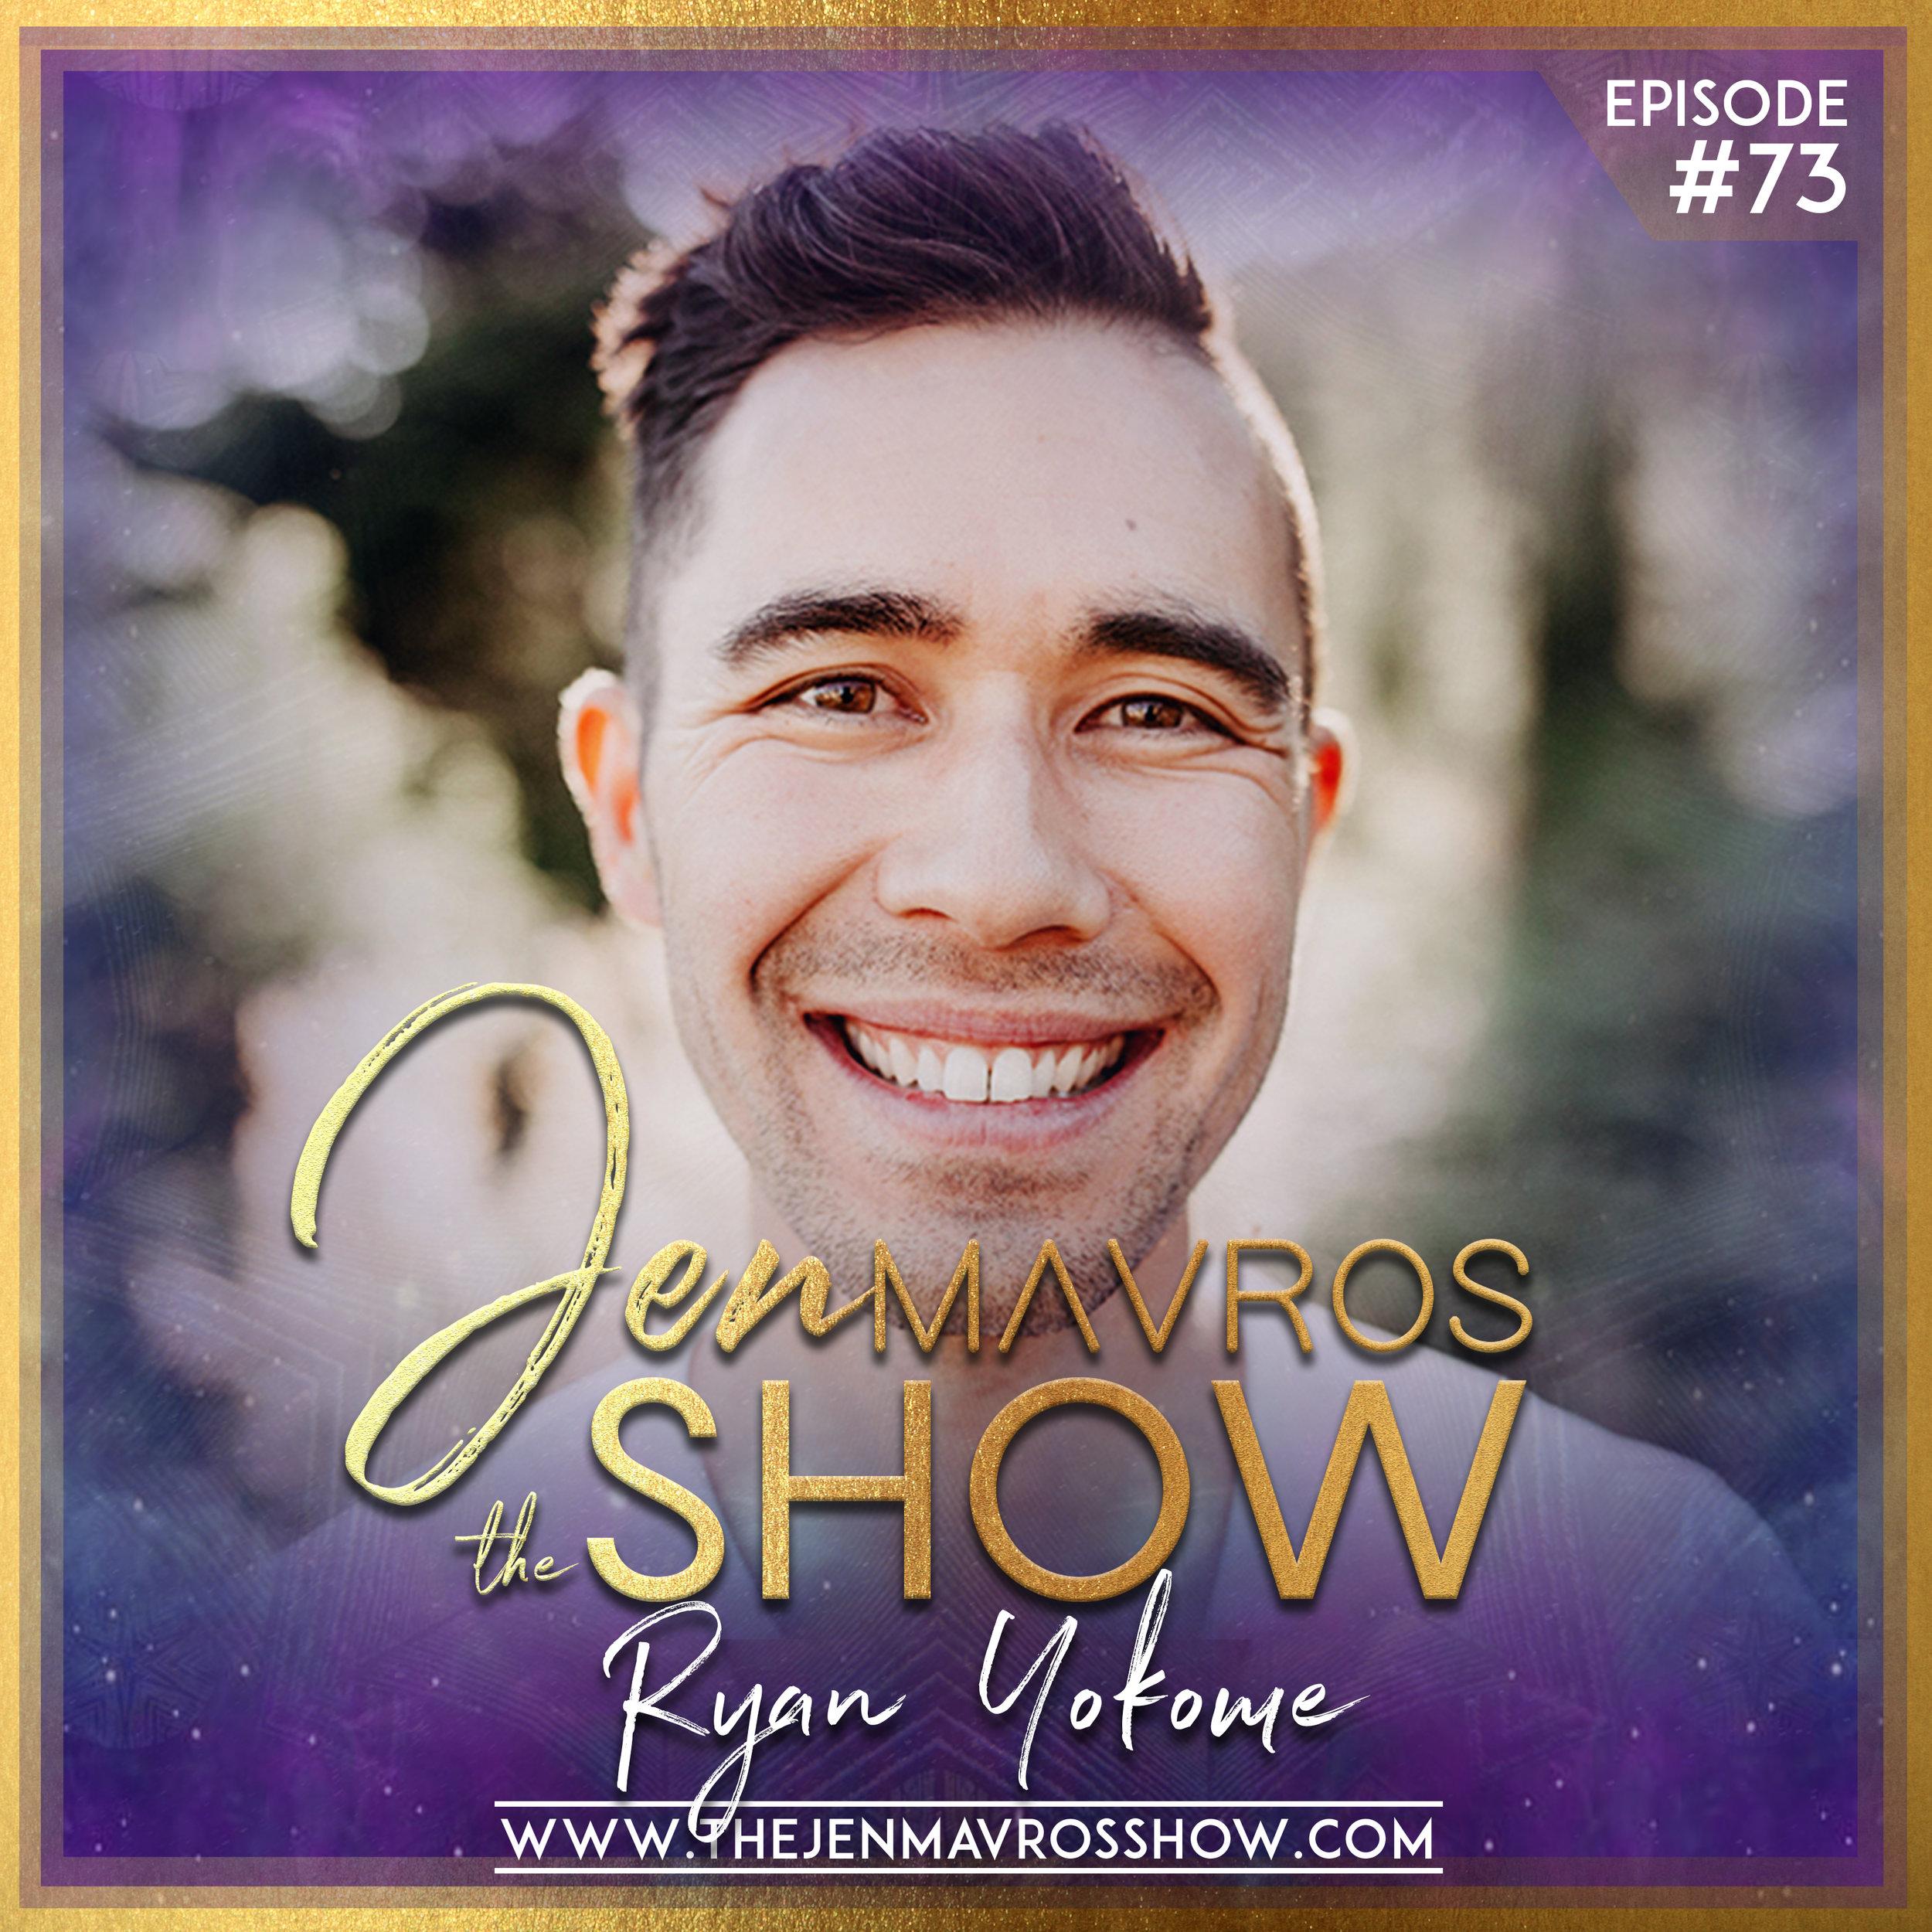 Ryan Yokome - Soul Wealth & Procrastination